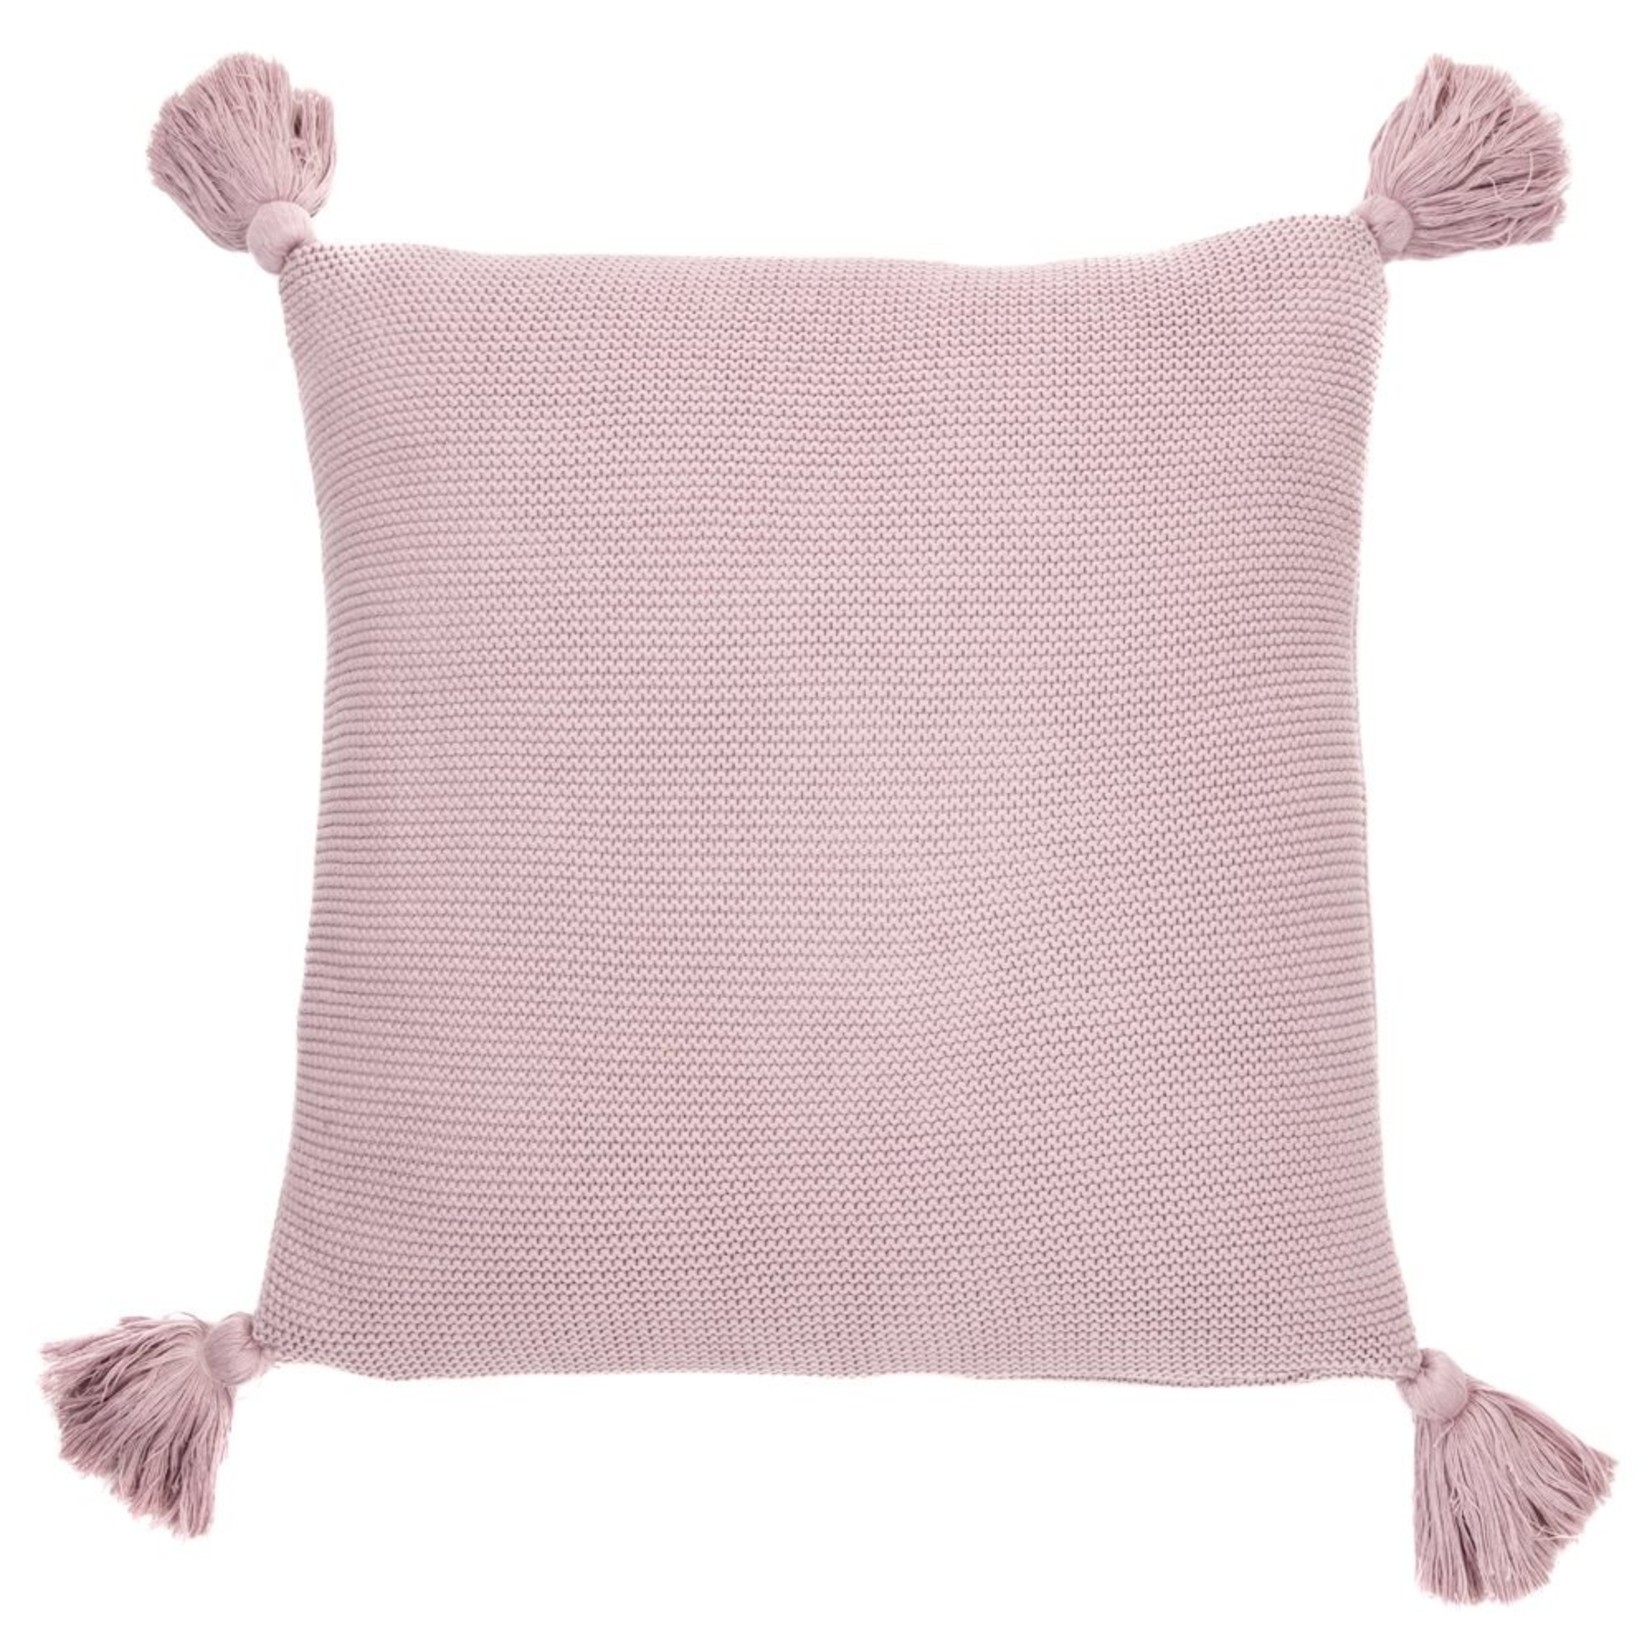 Brunelli Lyla Knitted Lilac Cushion